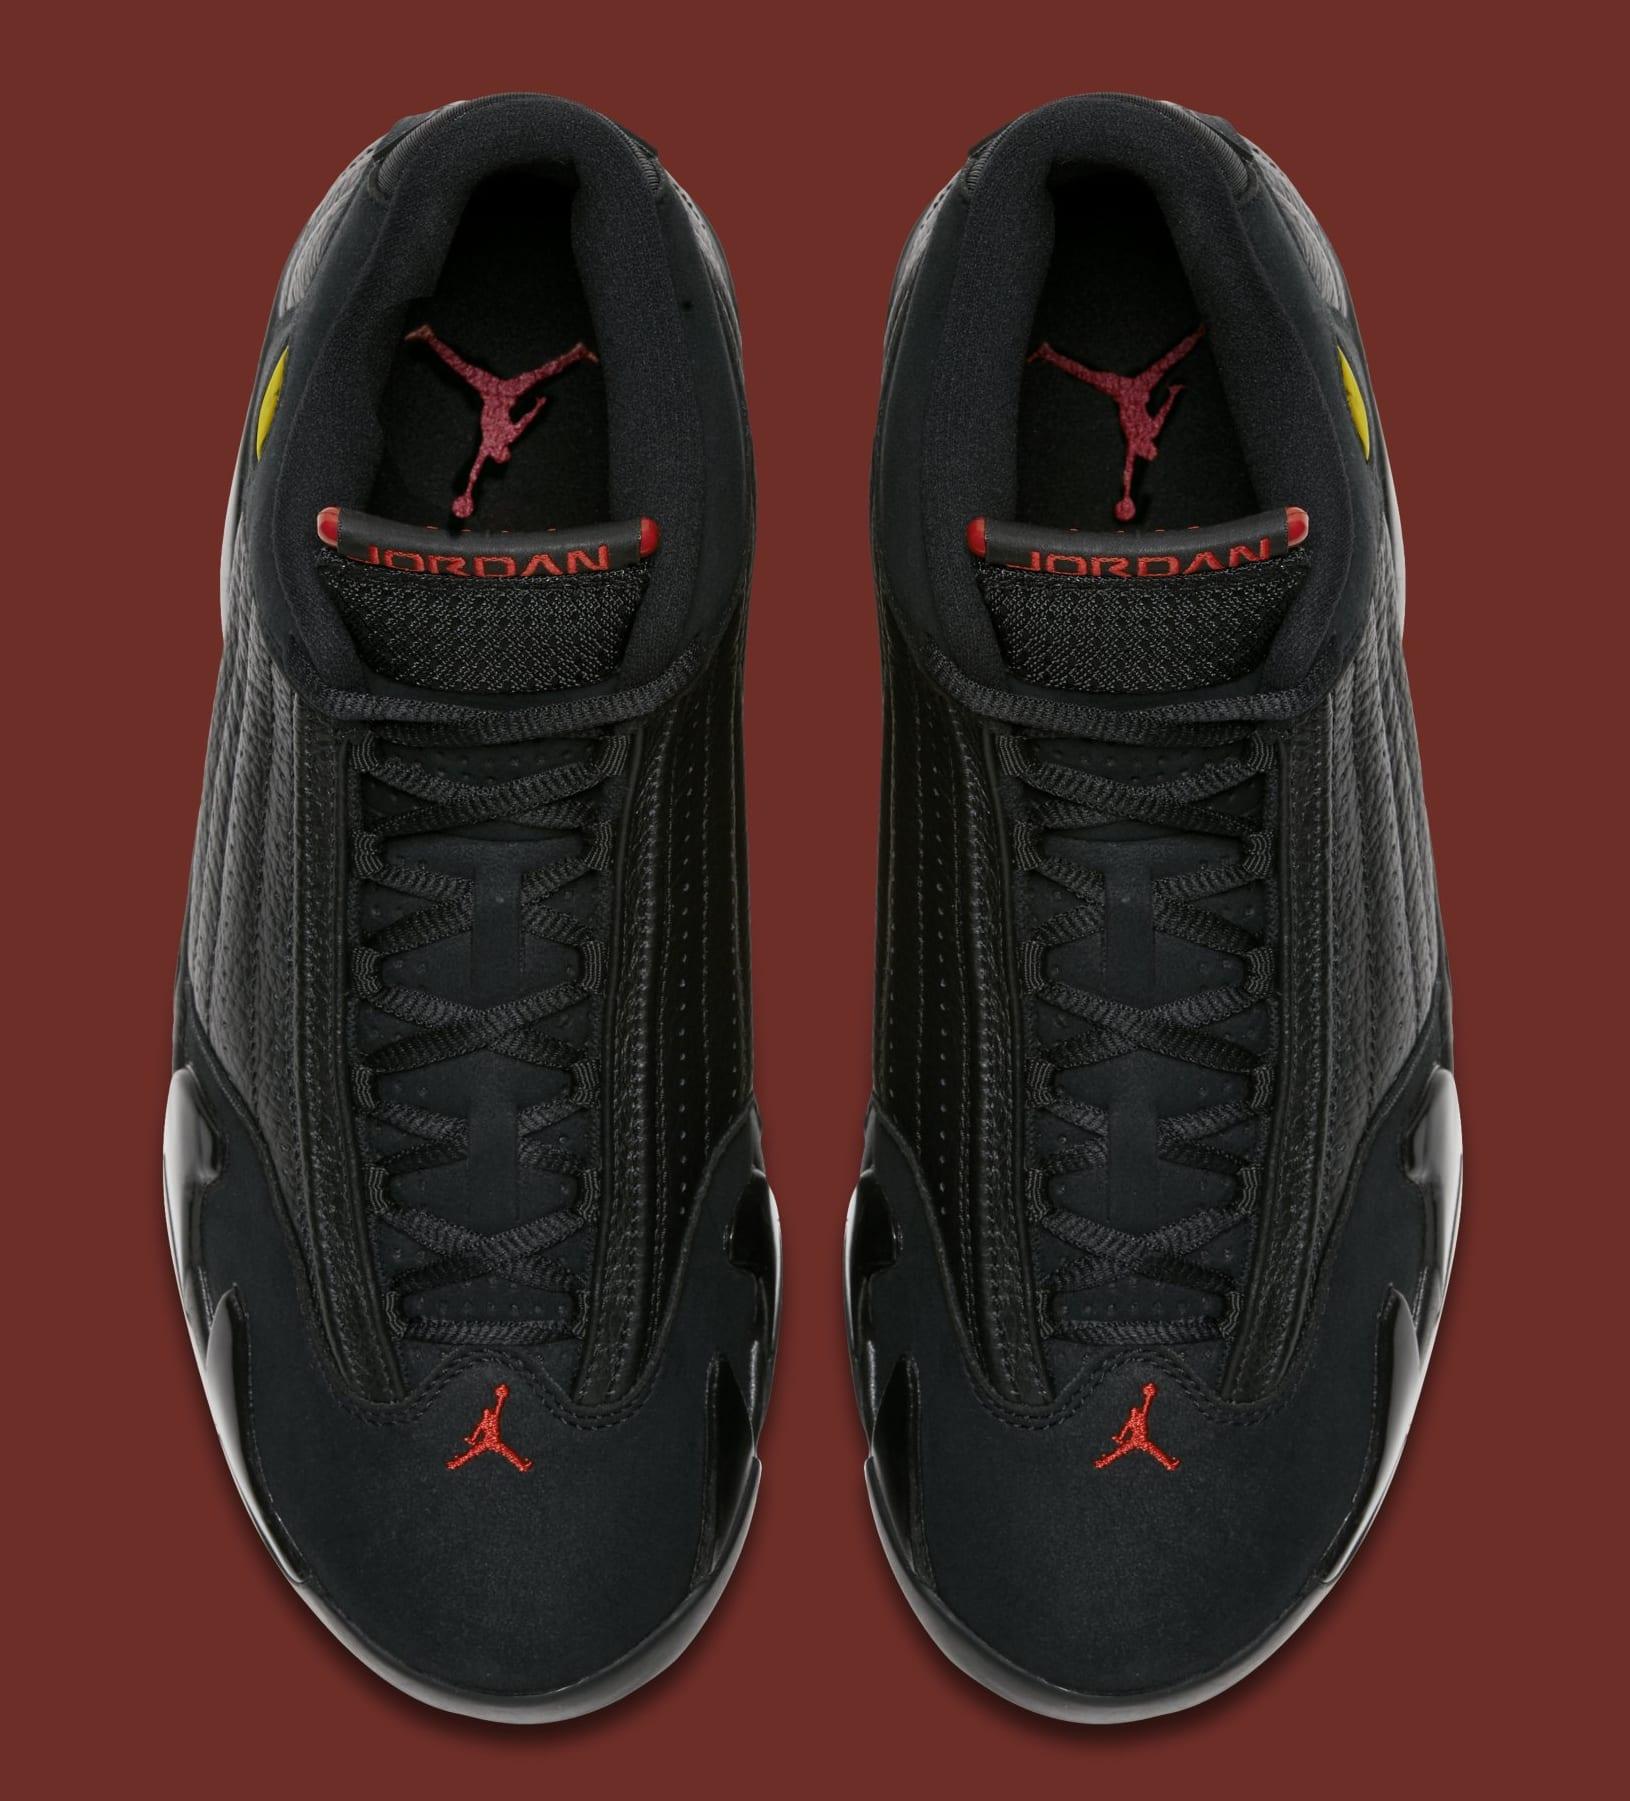 sale retailer 49dd8 eaf80 ... 487471-003. Image via Nike Air Jordan 14 Retro  Last Shot